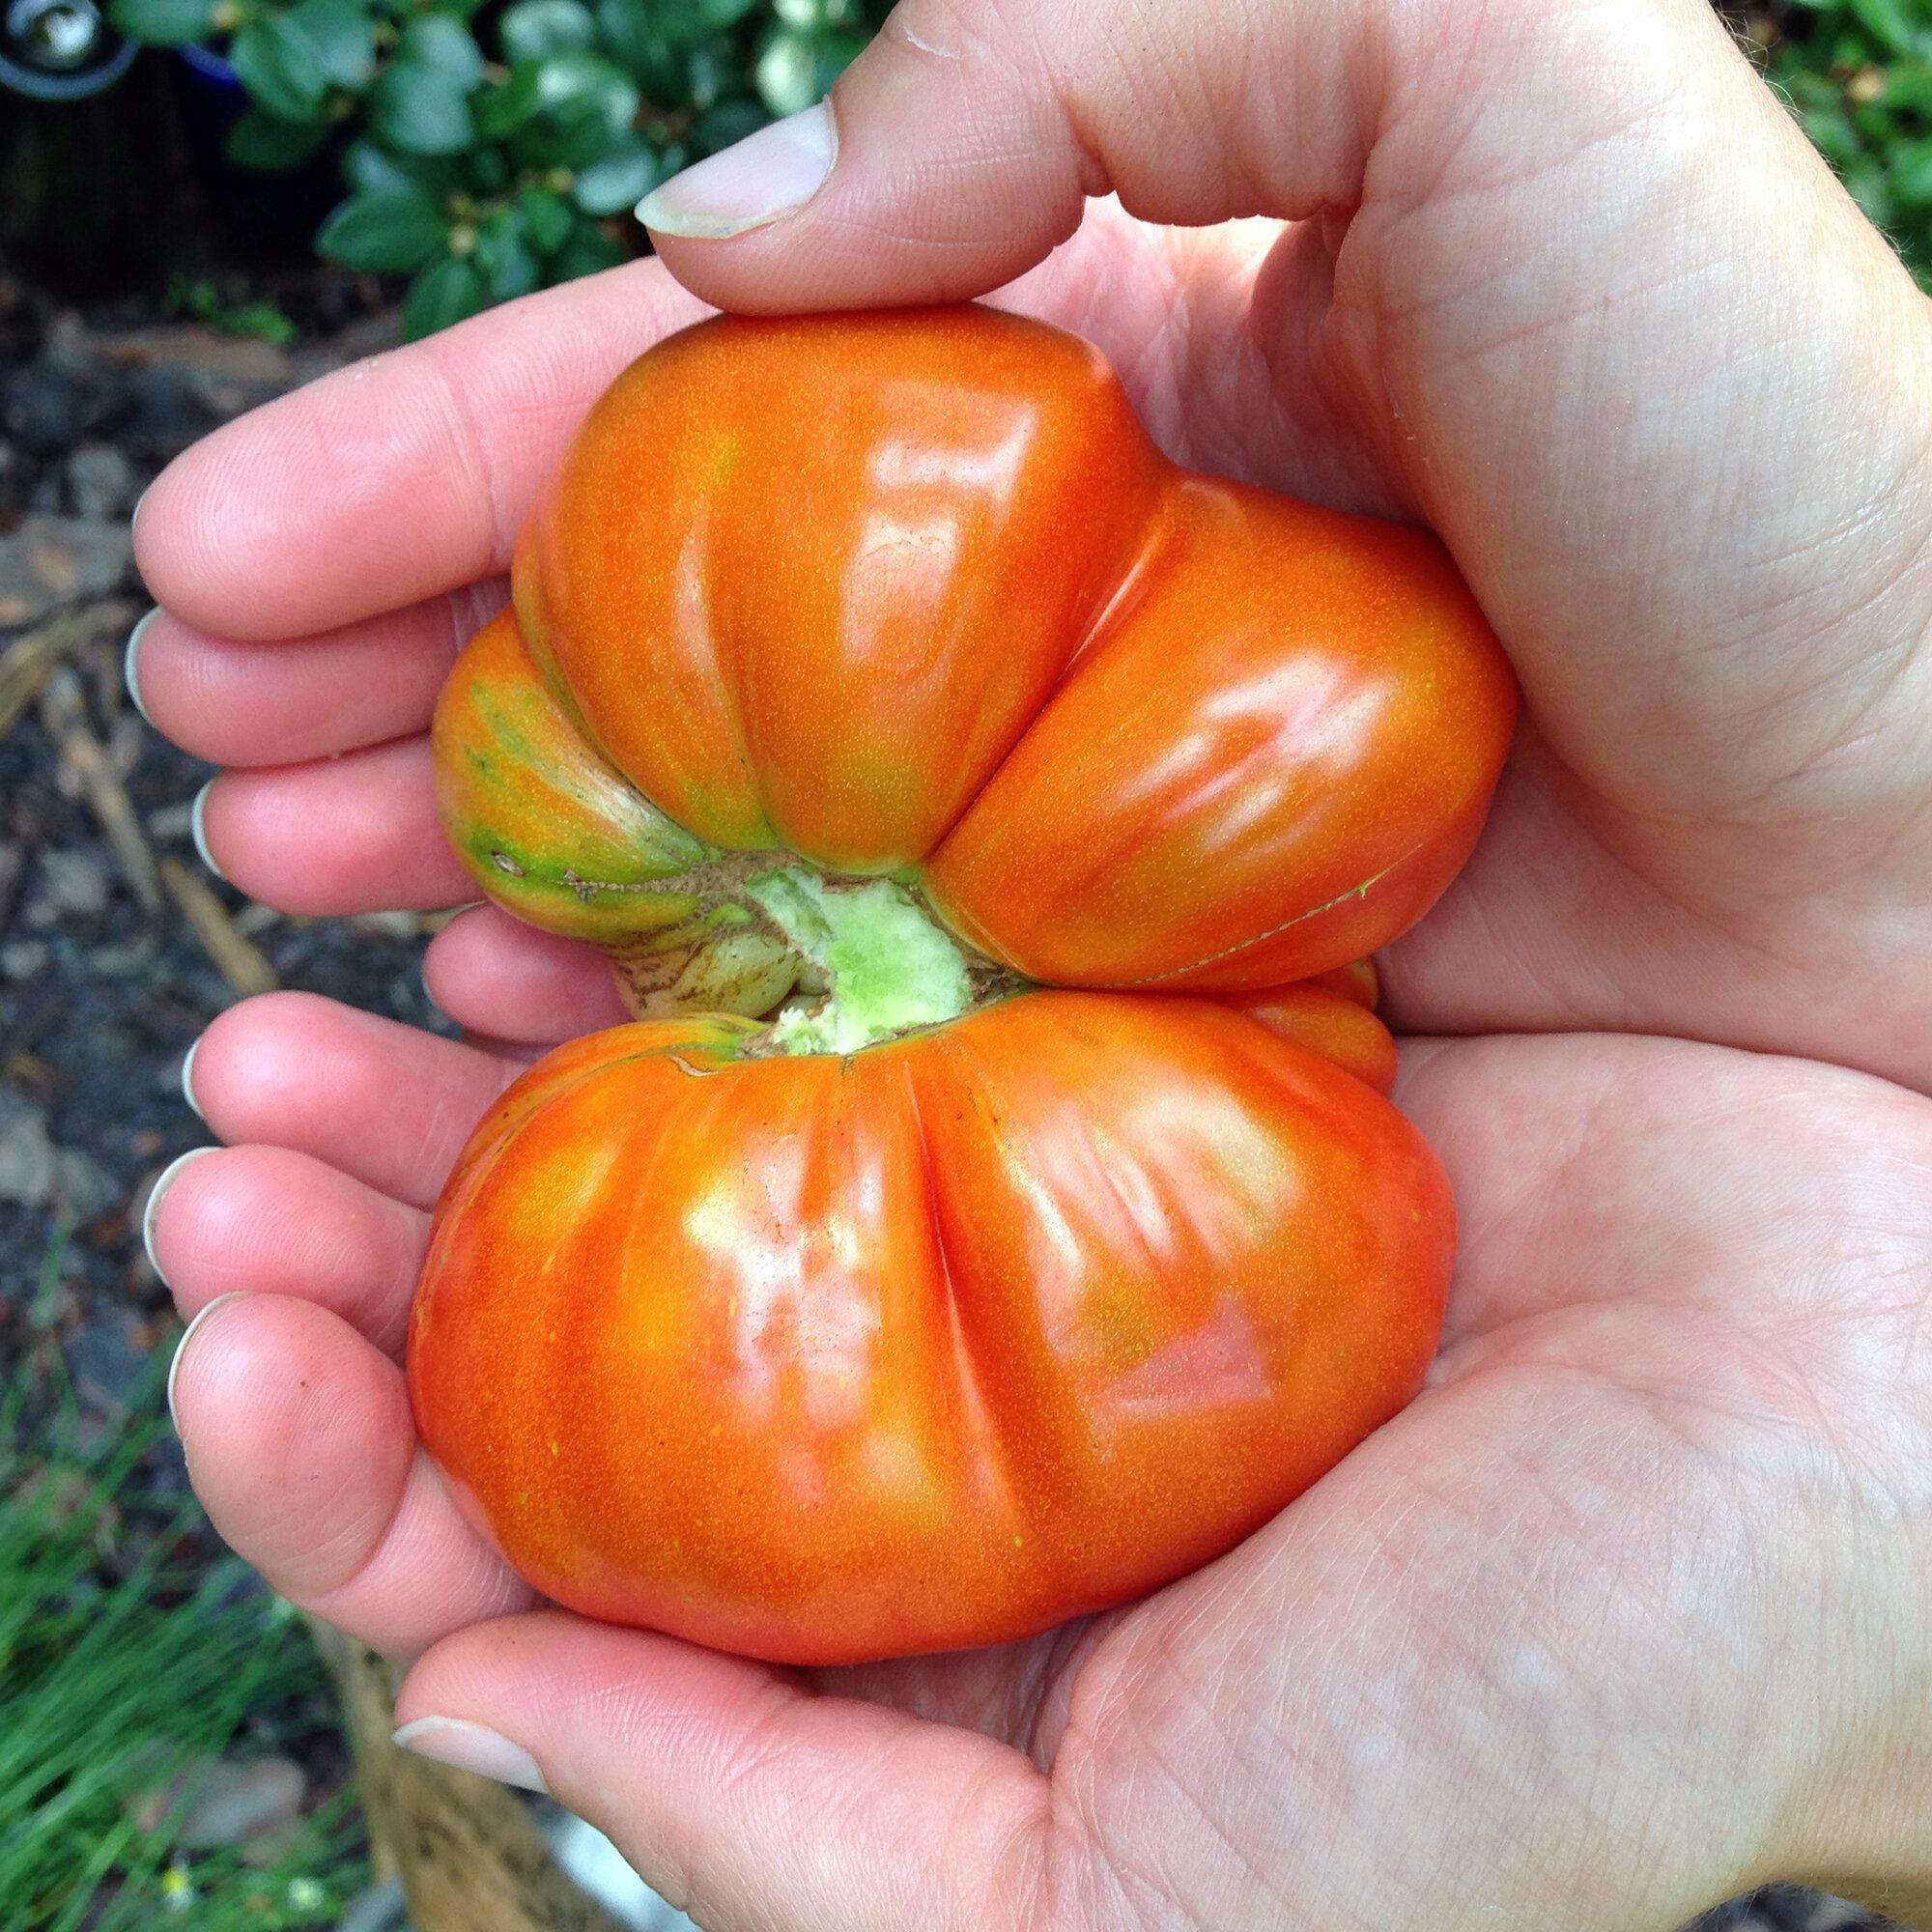 A beautiful heirloom tomato